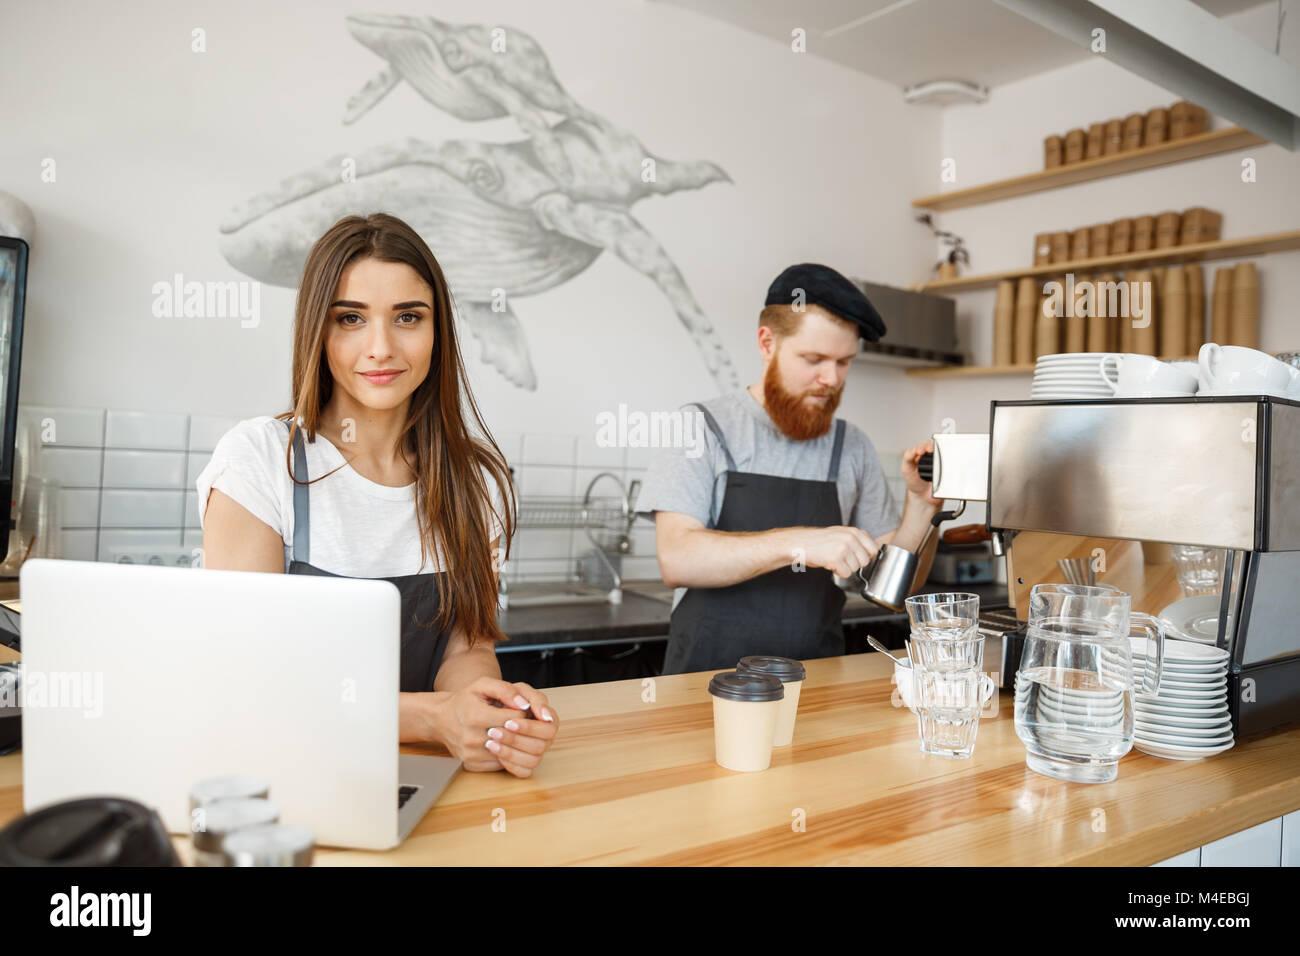 Kaffee Geschäftskonzept - Positive junger bärtiger Mann und schöne attraktive Lady barista Paar gemeinsam Stockbild